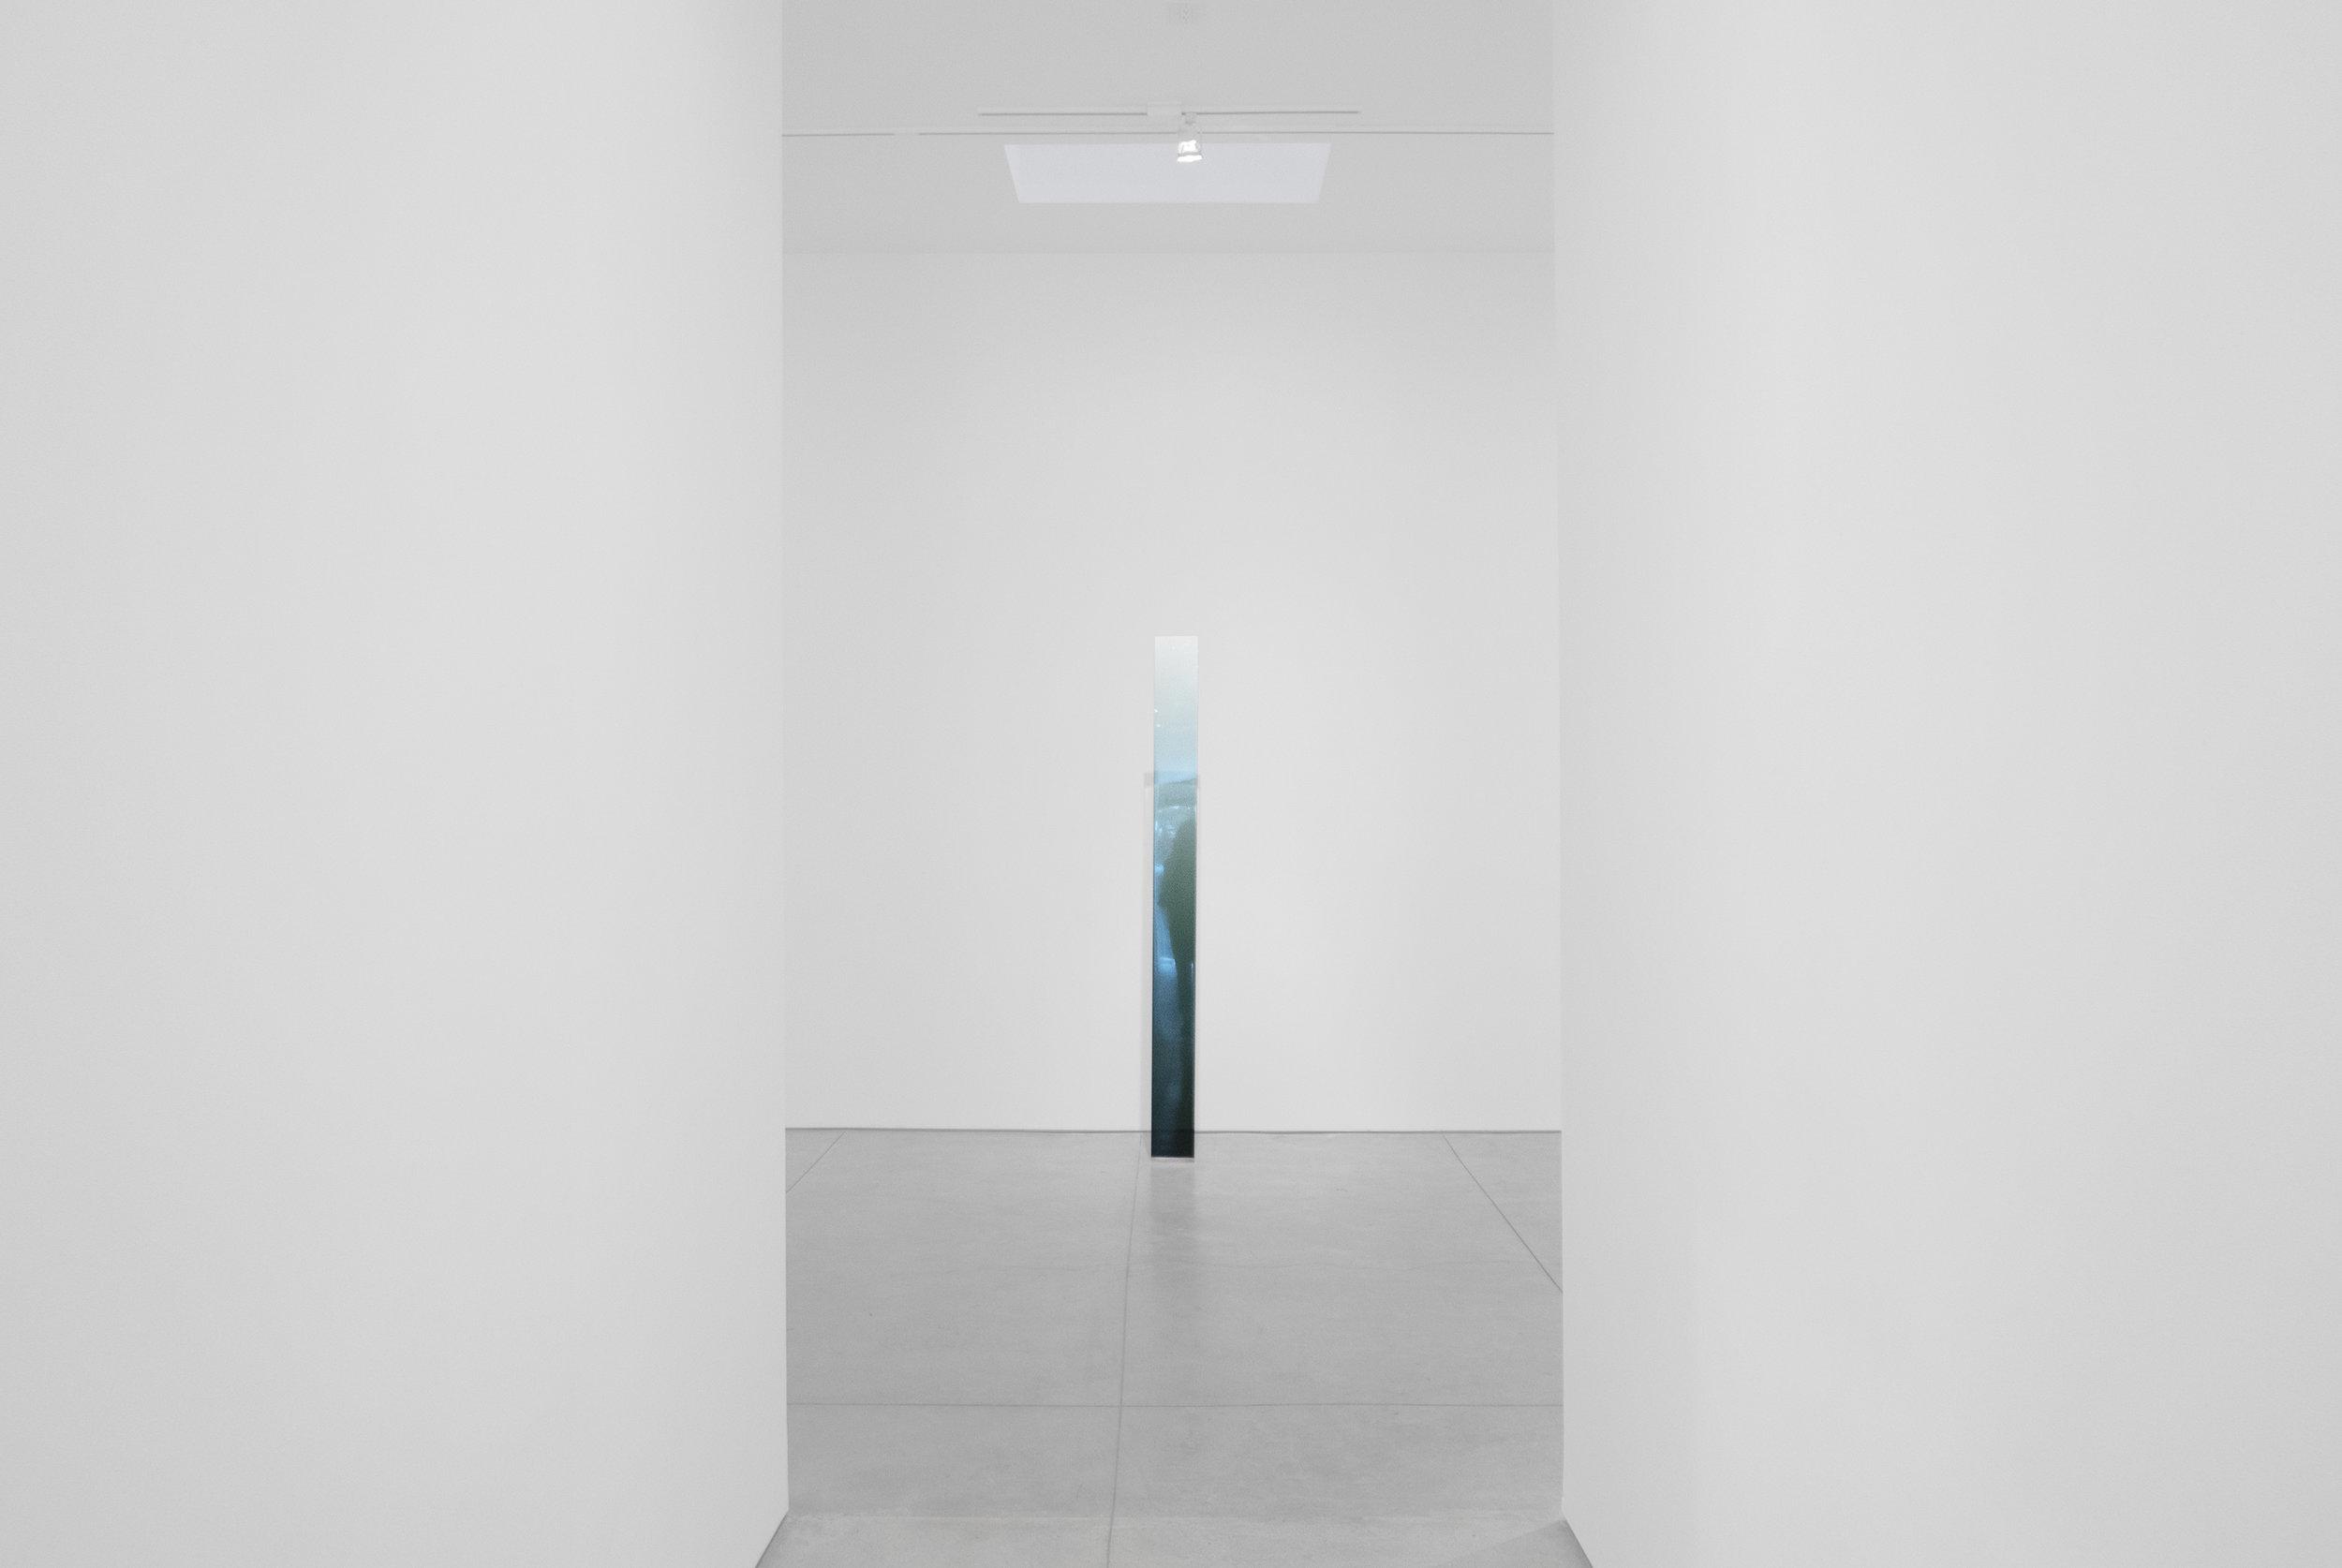 25 Years_Peter Blake Gallery_2019_Installation View_34.jpg